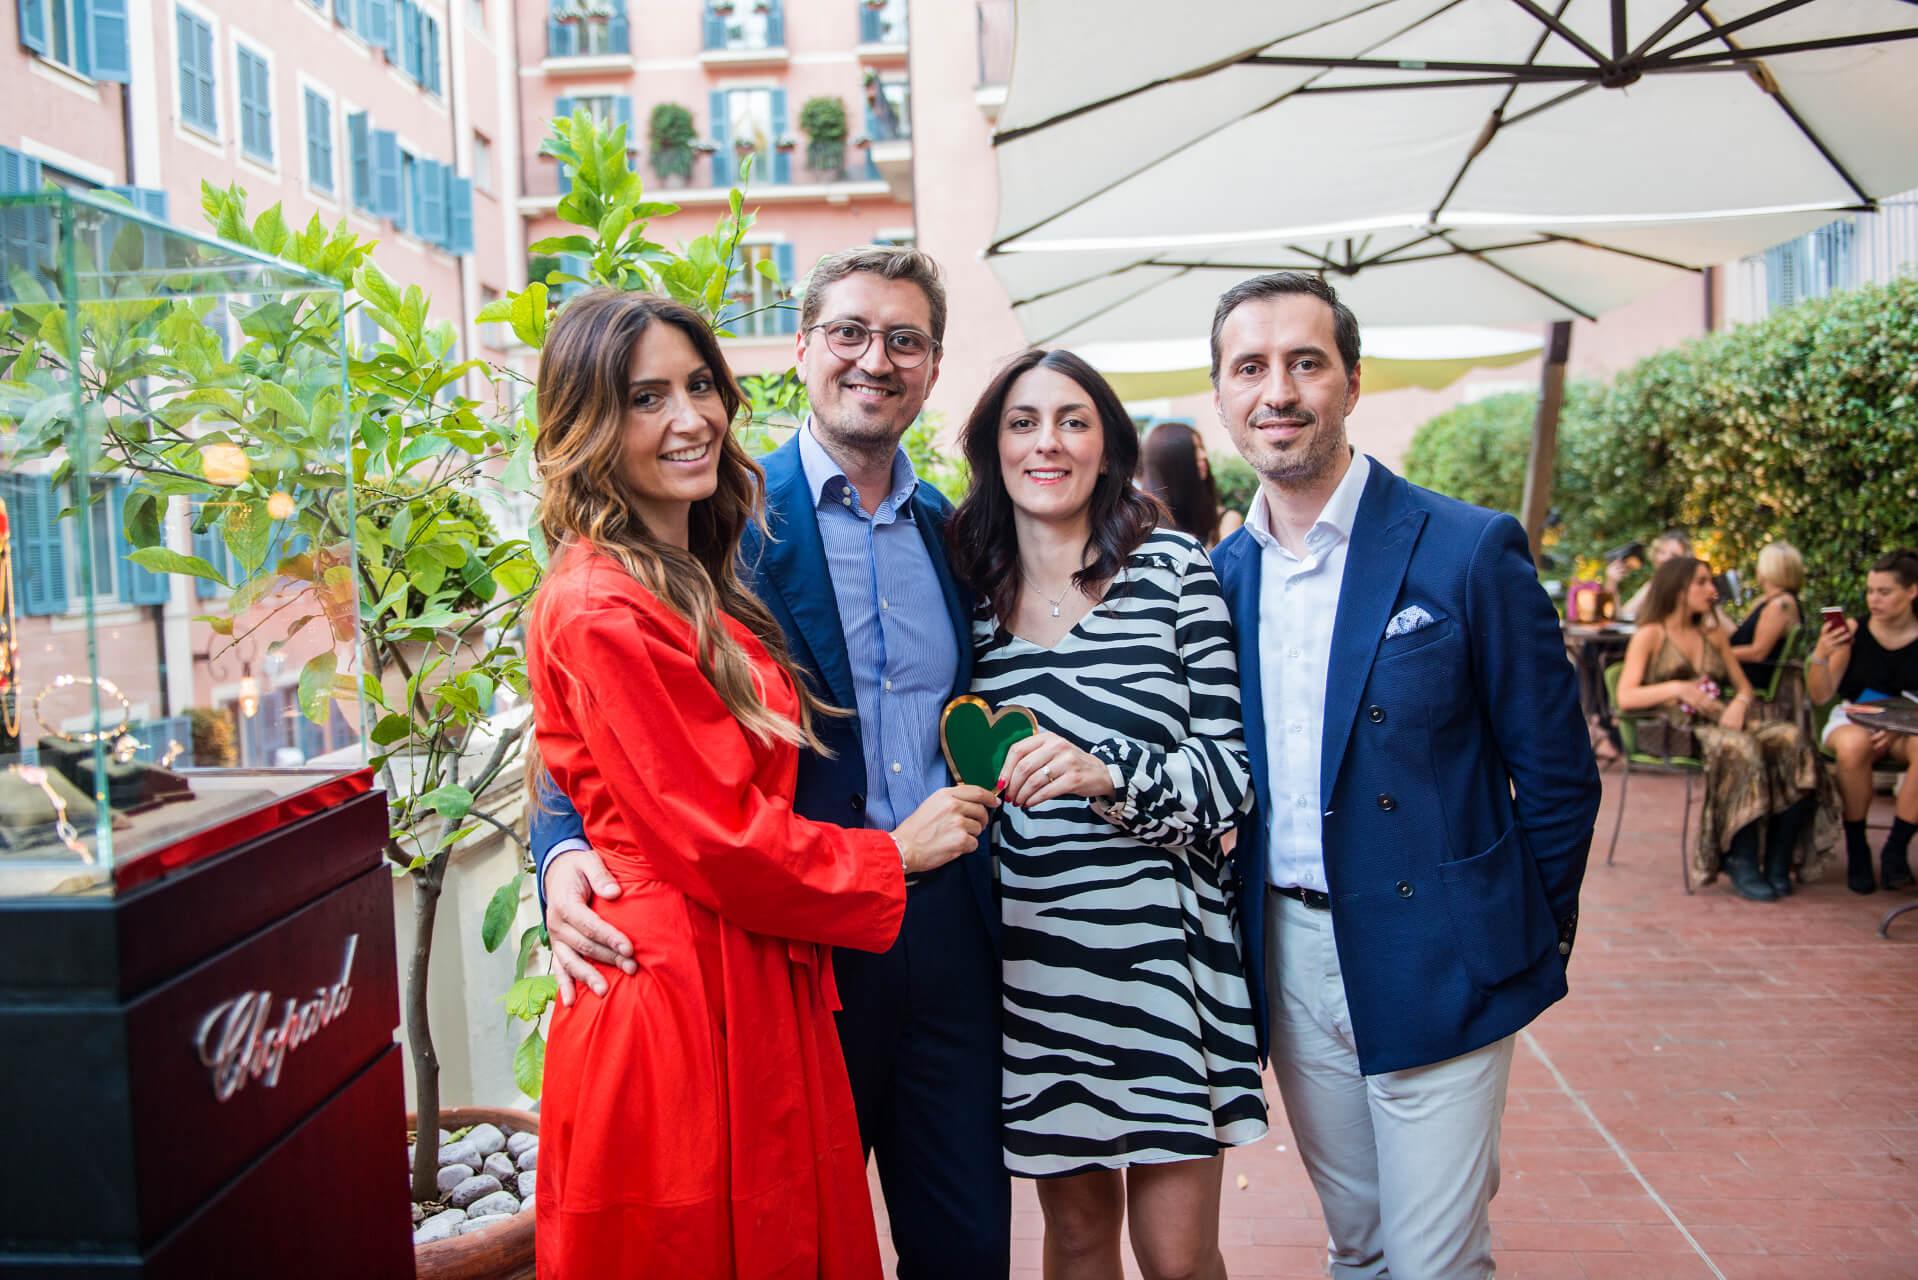 Susanna Refrigeri, Diego and Emanuele Cataldi, Sharon Ricciotti